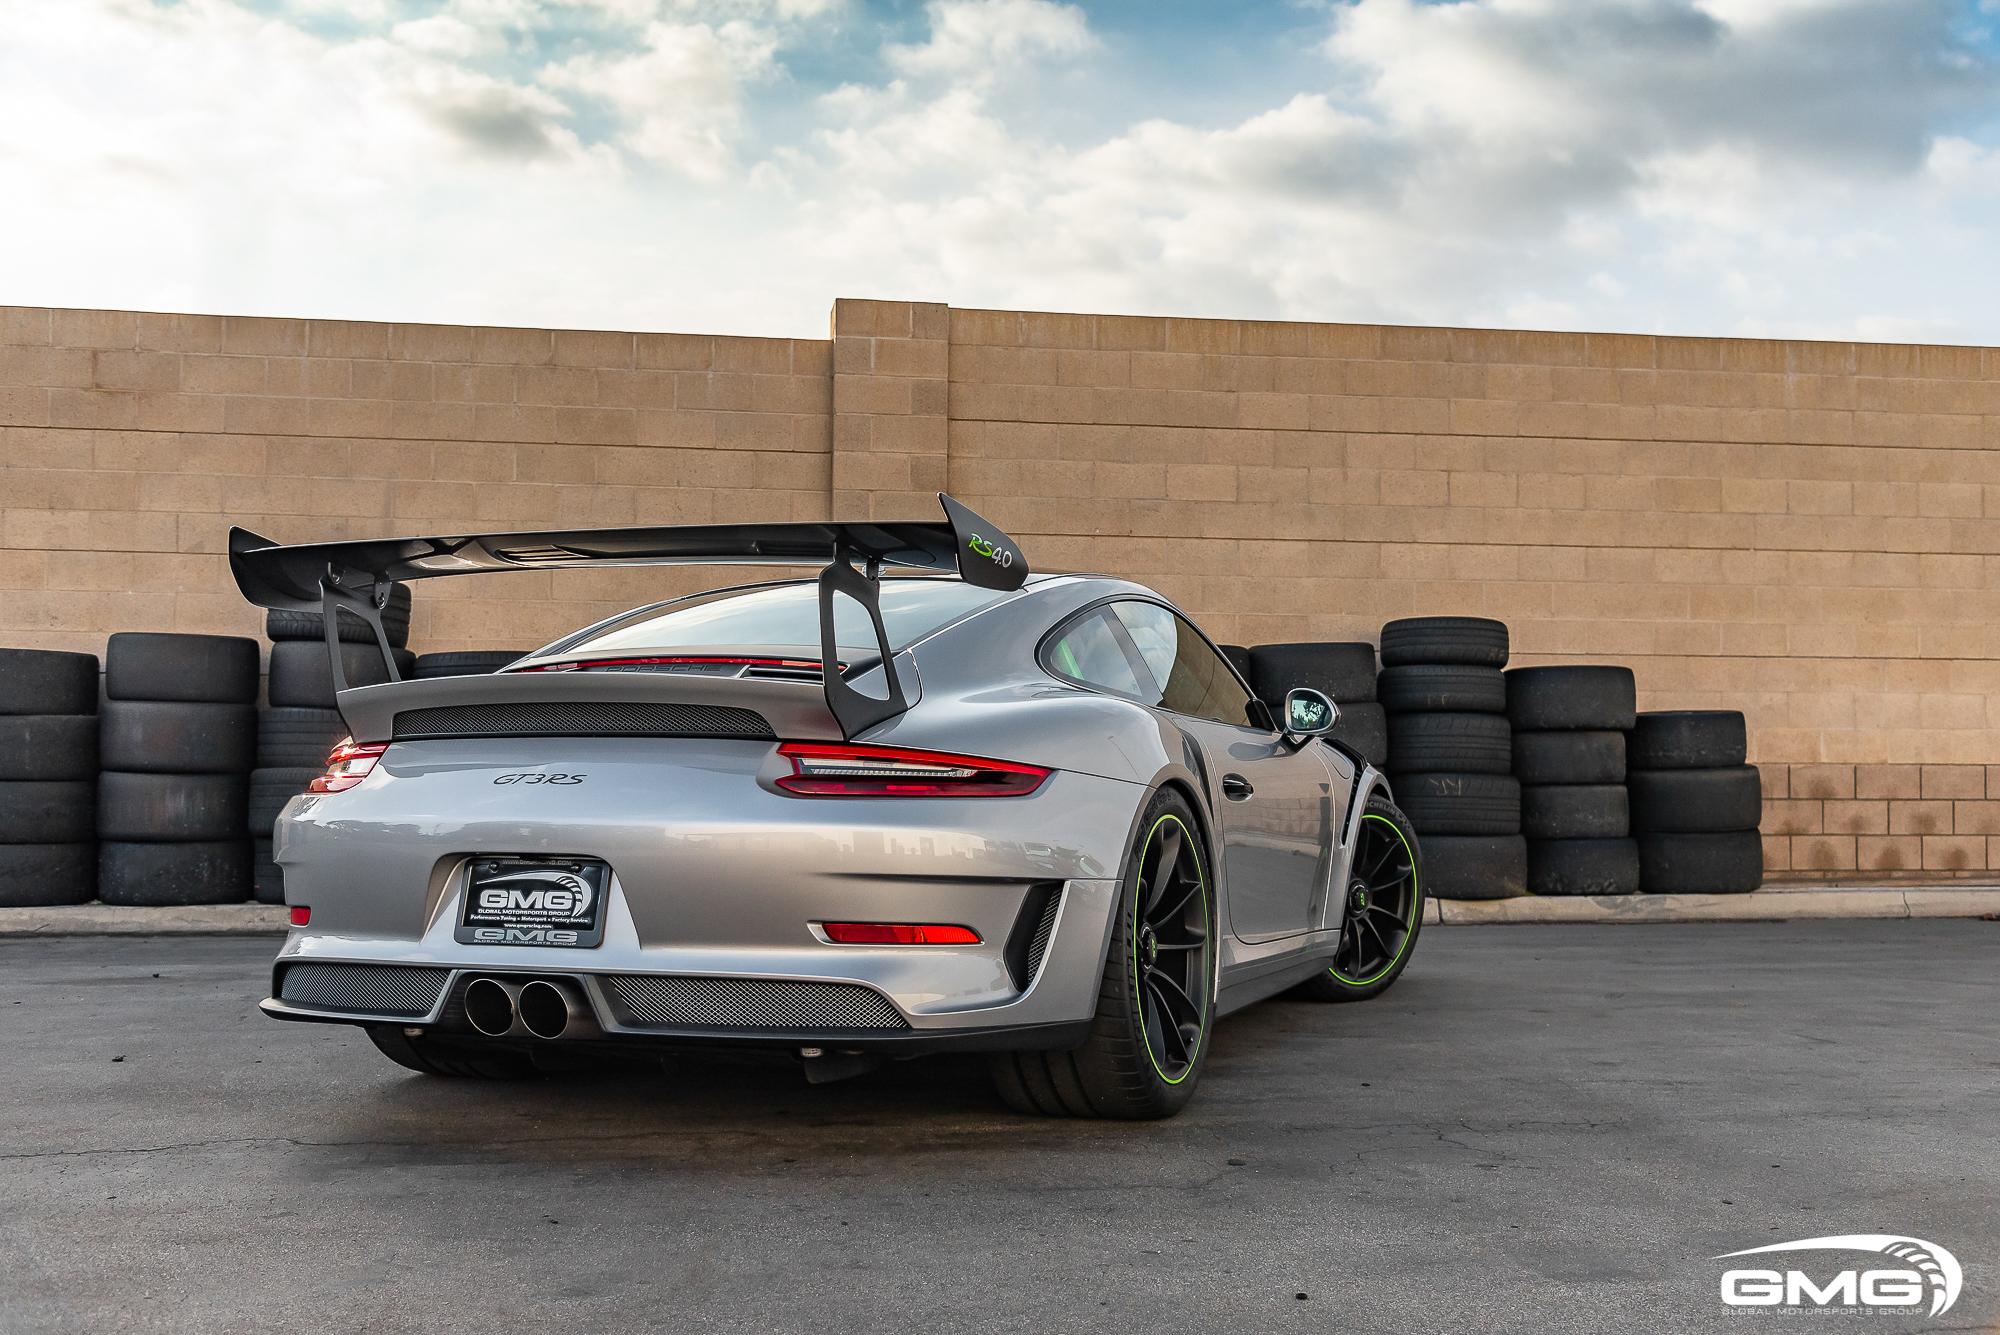 Silver Porsche 991.2 GT3 RS